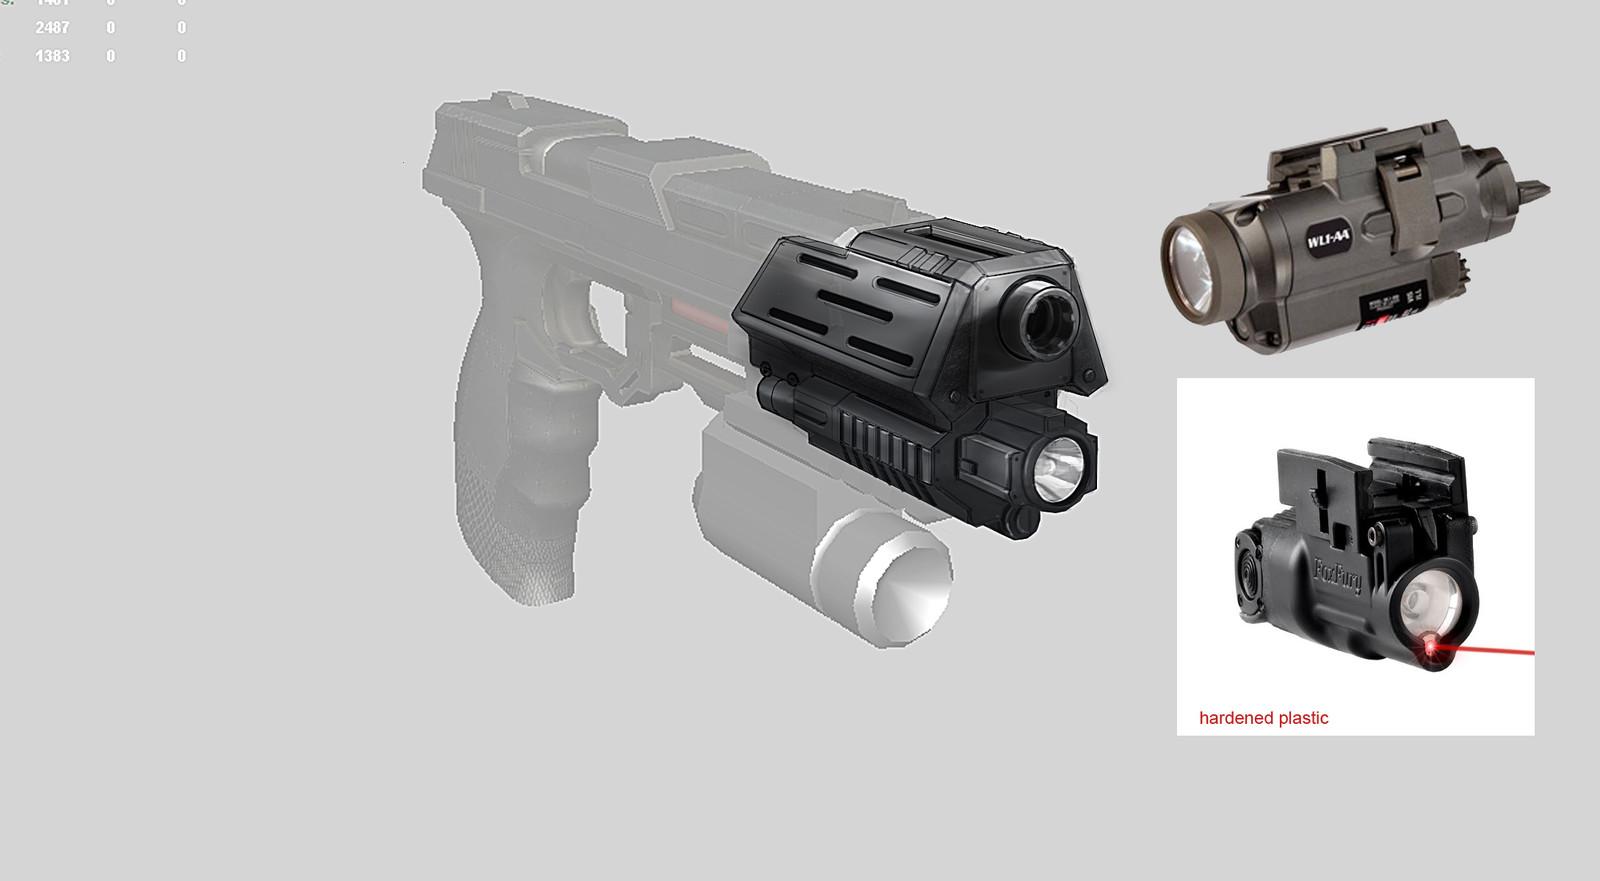 Pistol upgrade attachment